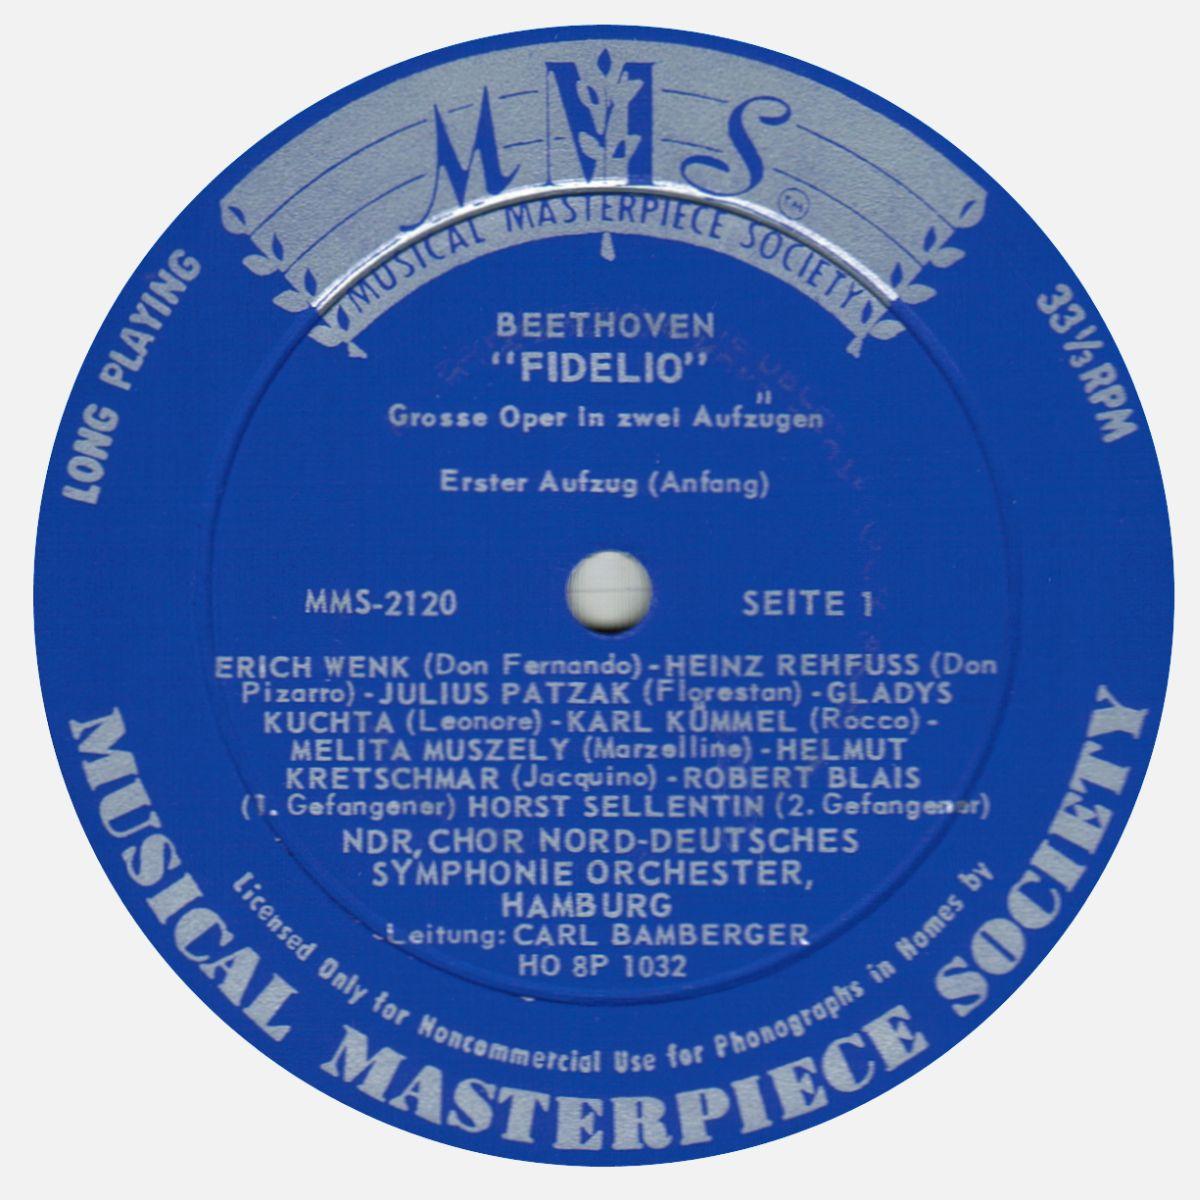 MMS 2135, Étiquette recto disque MMS-2120